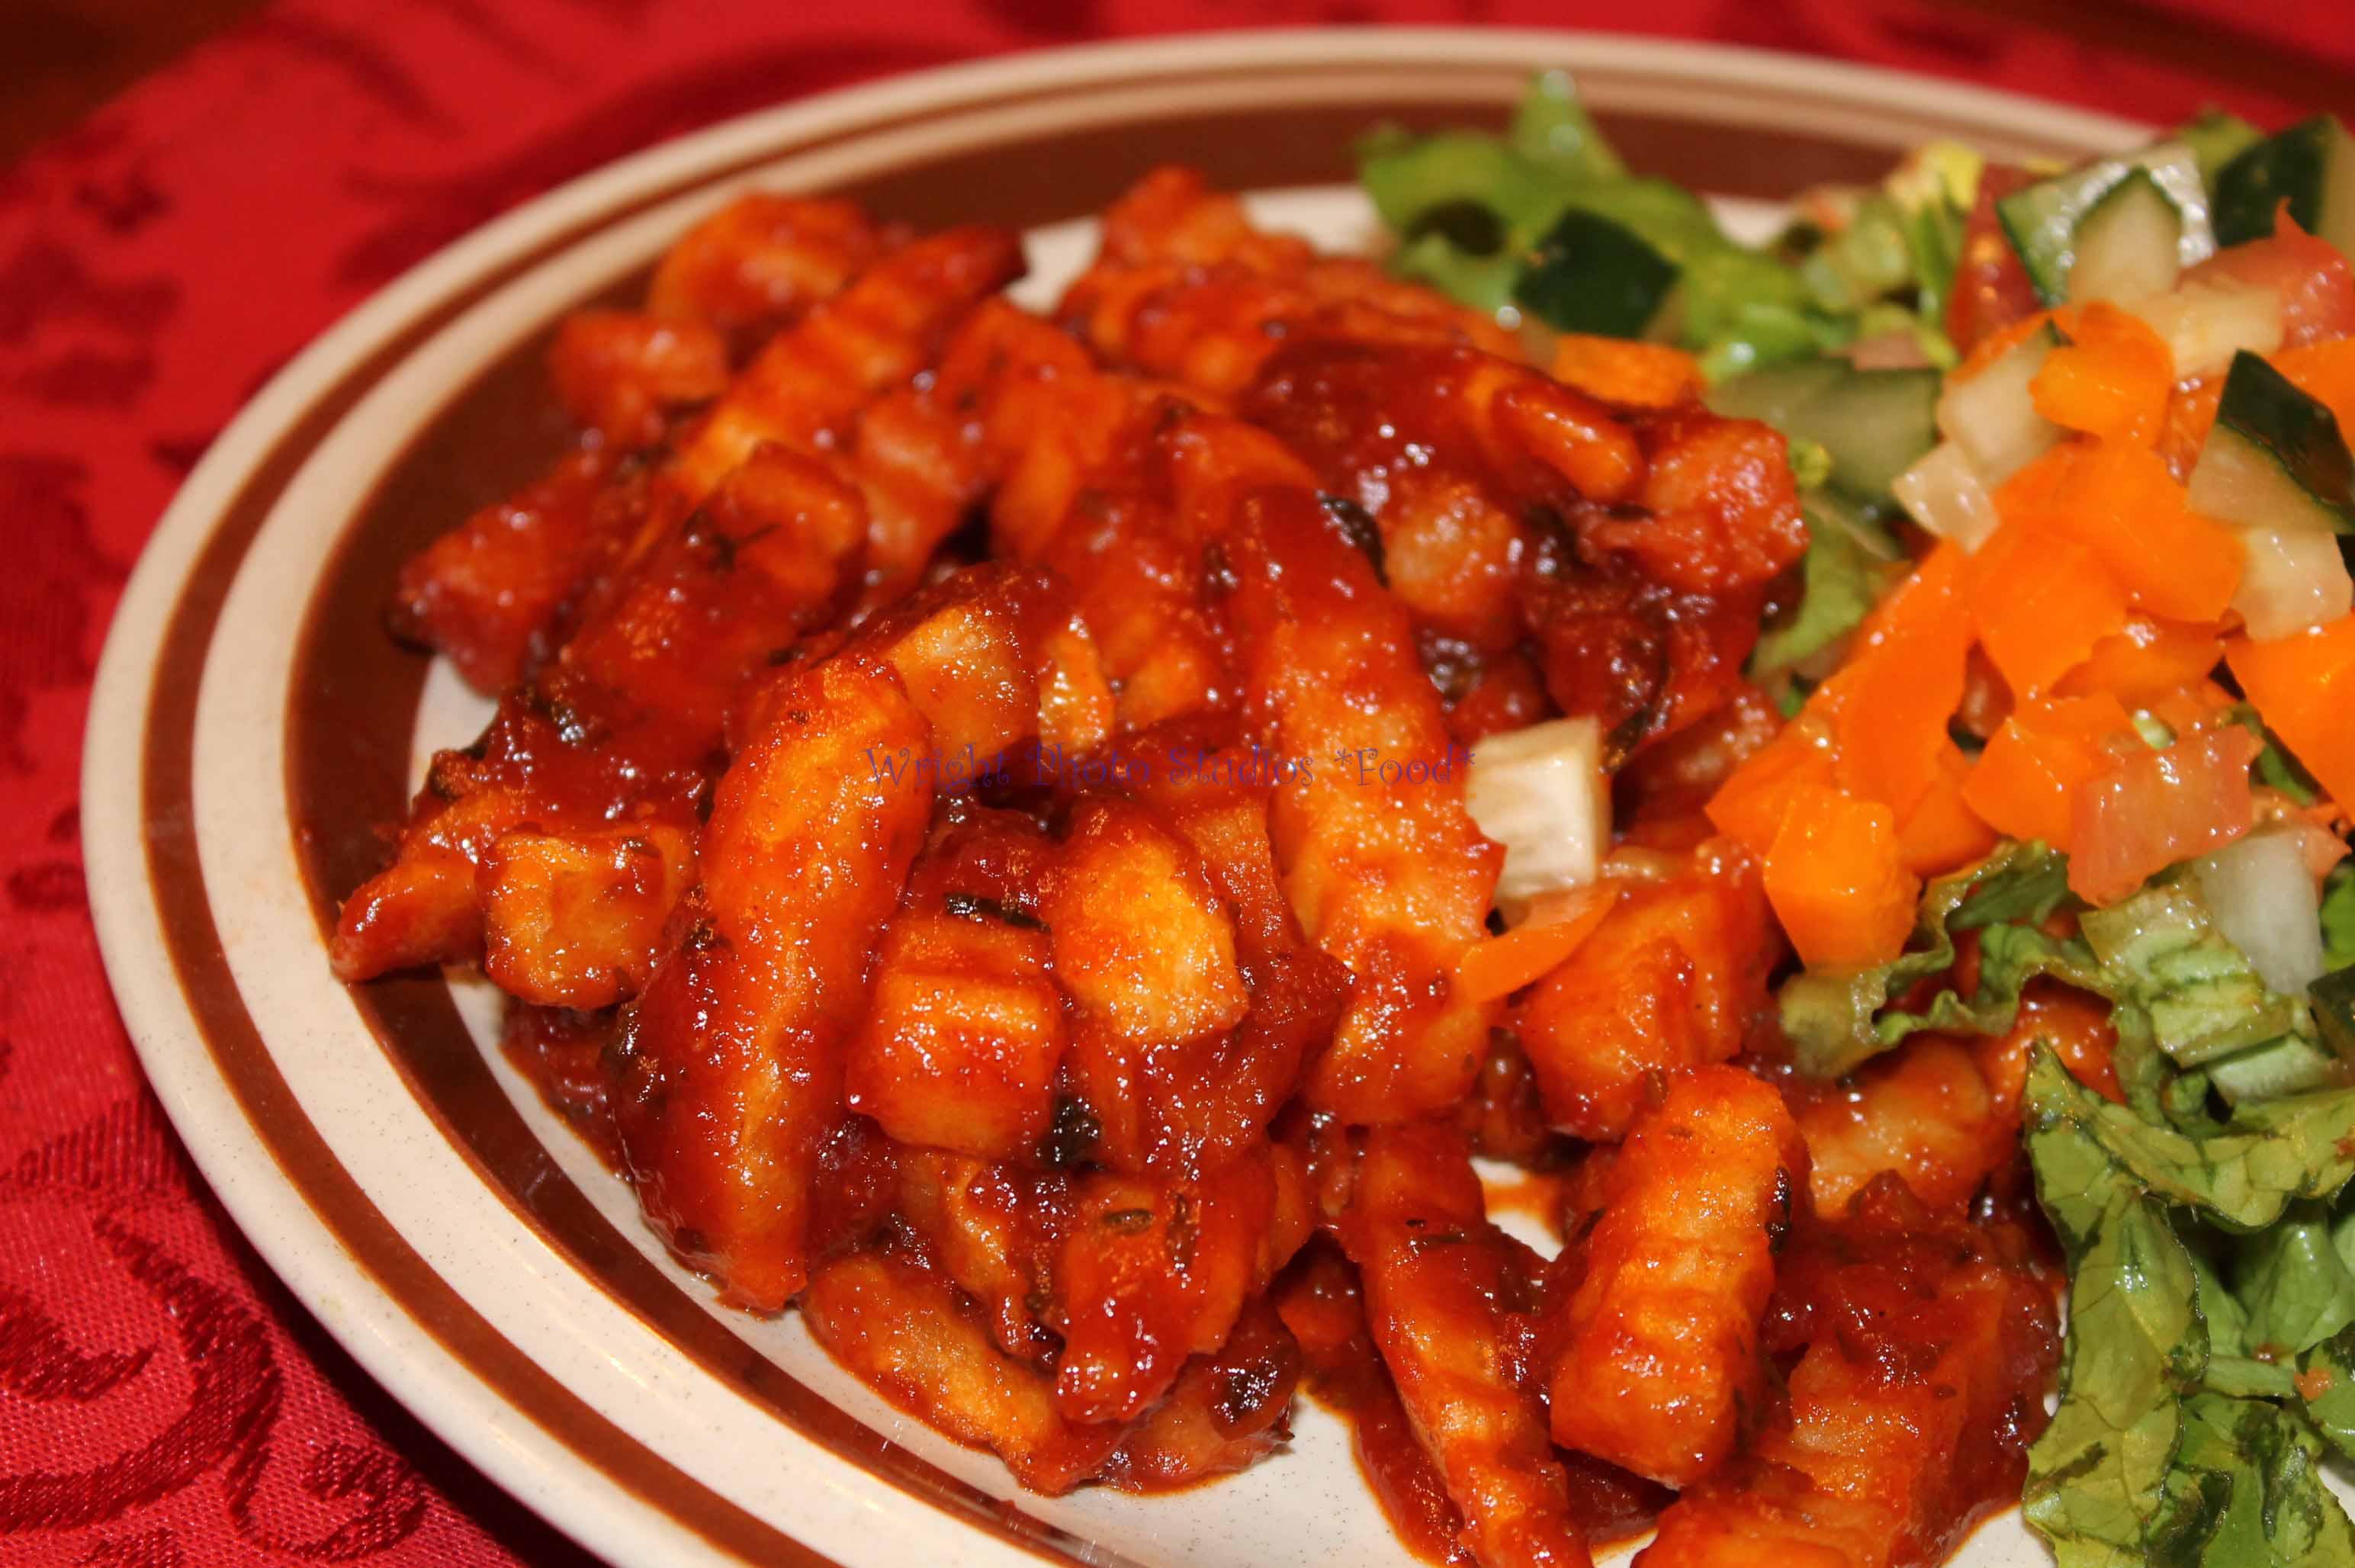 Masala chips masala fries scrumplicious food masala chips masala fries at home forumfinder Images